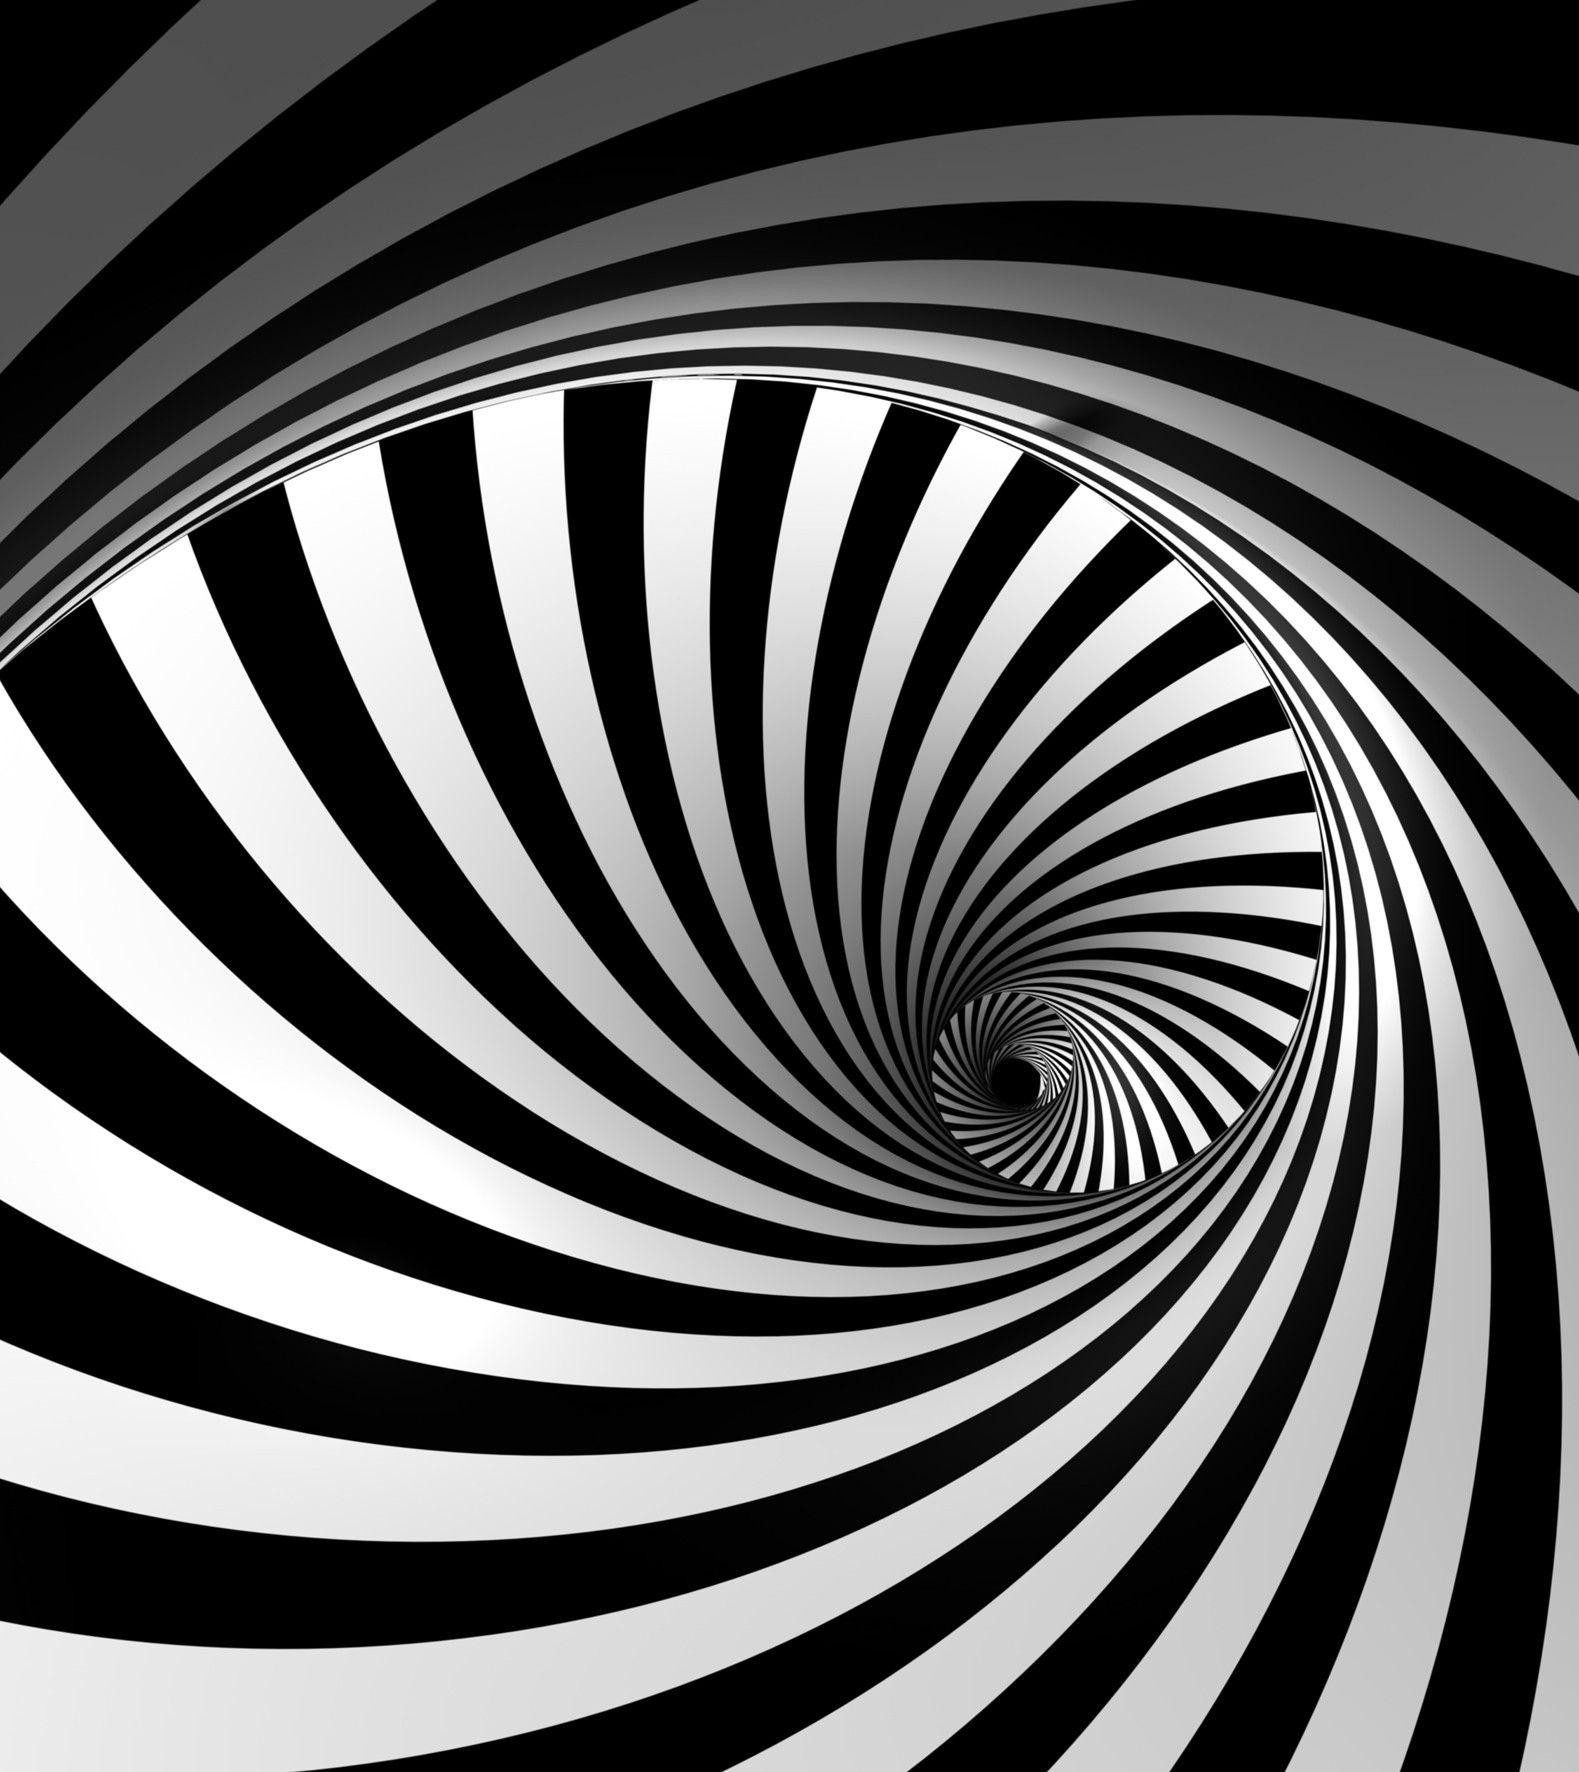 Spirale Fototapete Tapeten Wandbilder Tapeten